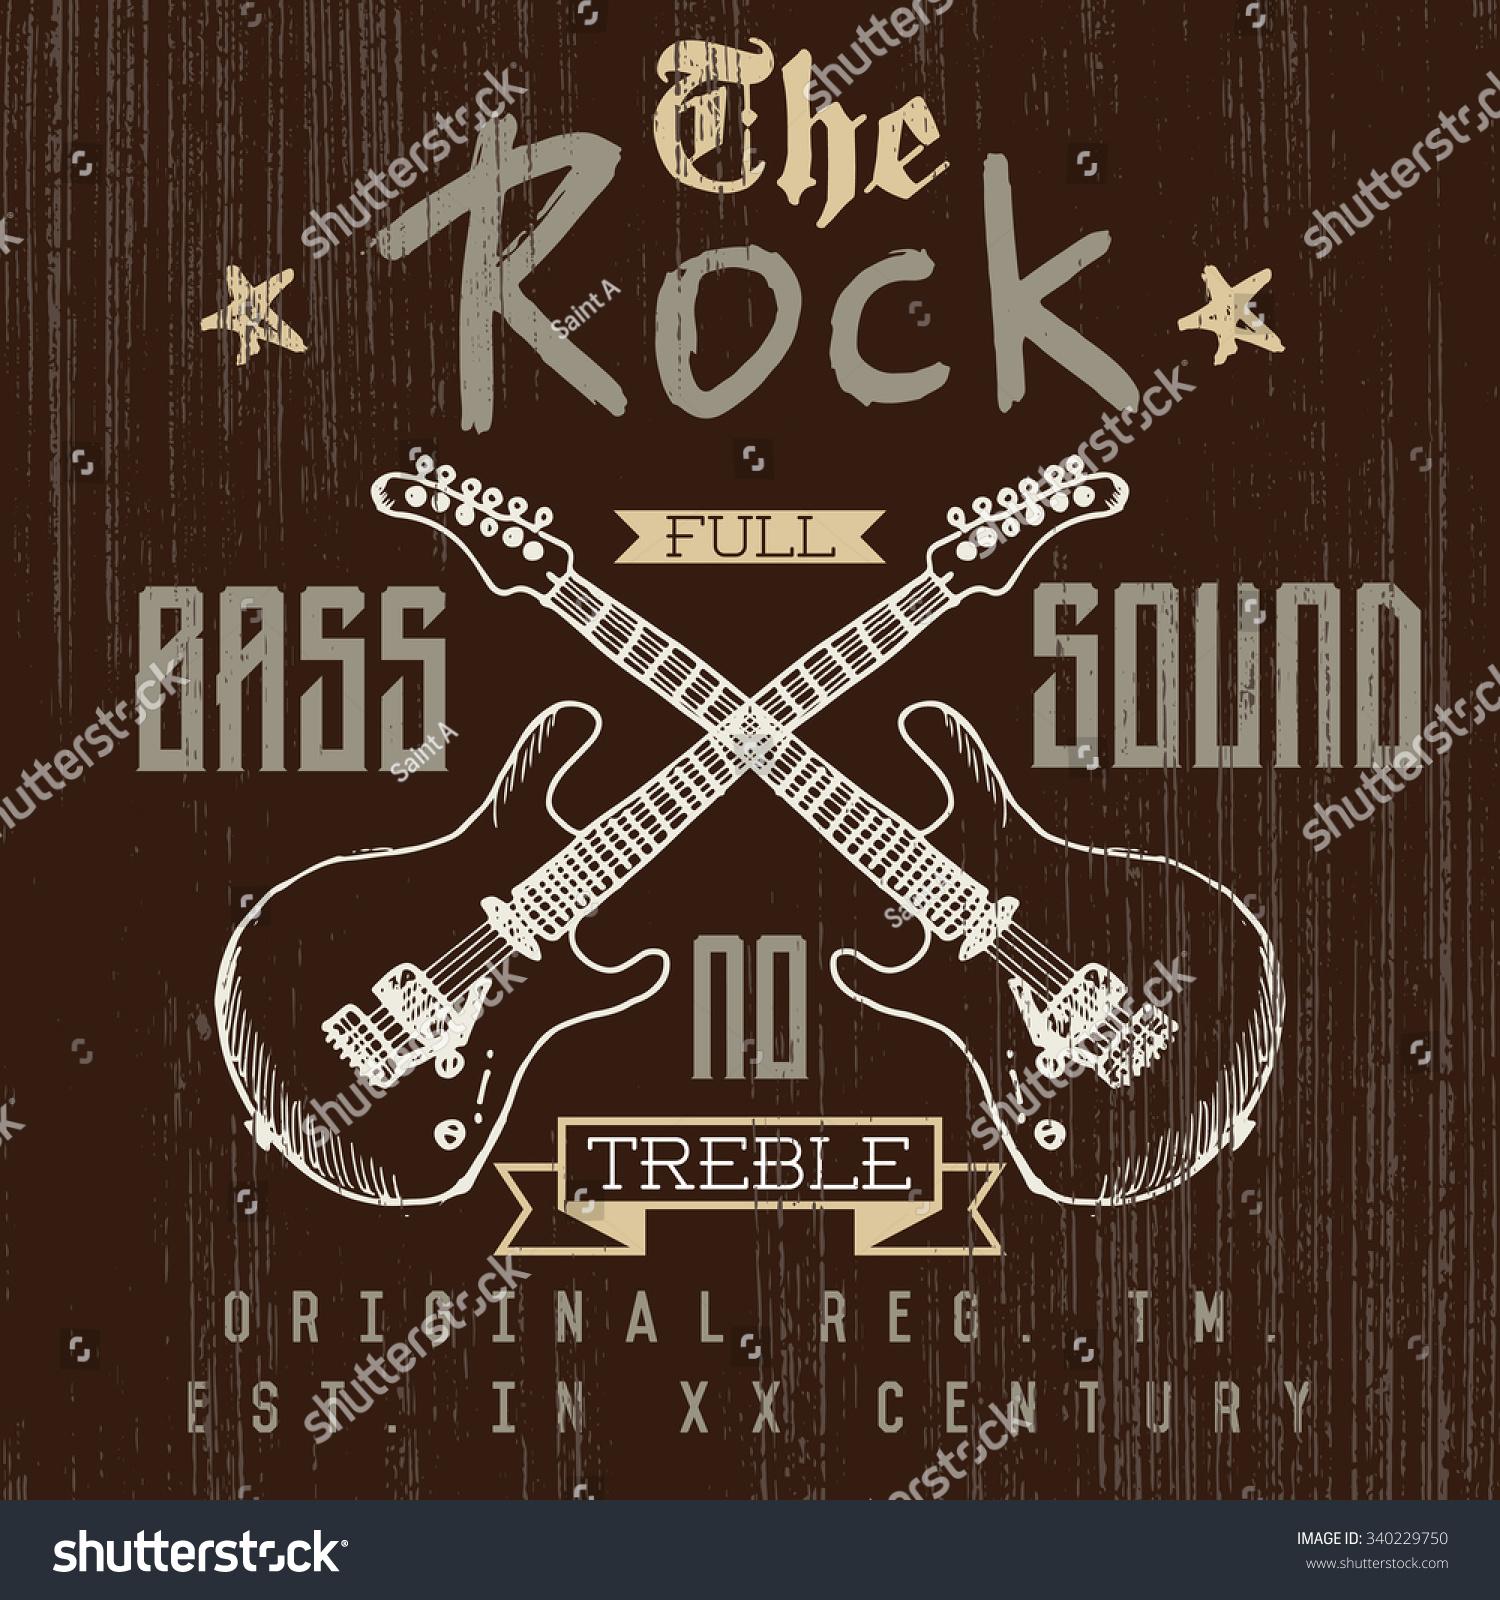 Shirt design london - T Shirt Printing Design Typography Graphics London Rock Festival Vector Illustration With Grunge